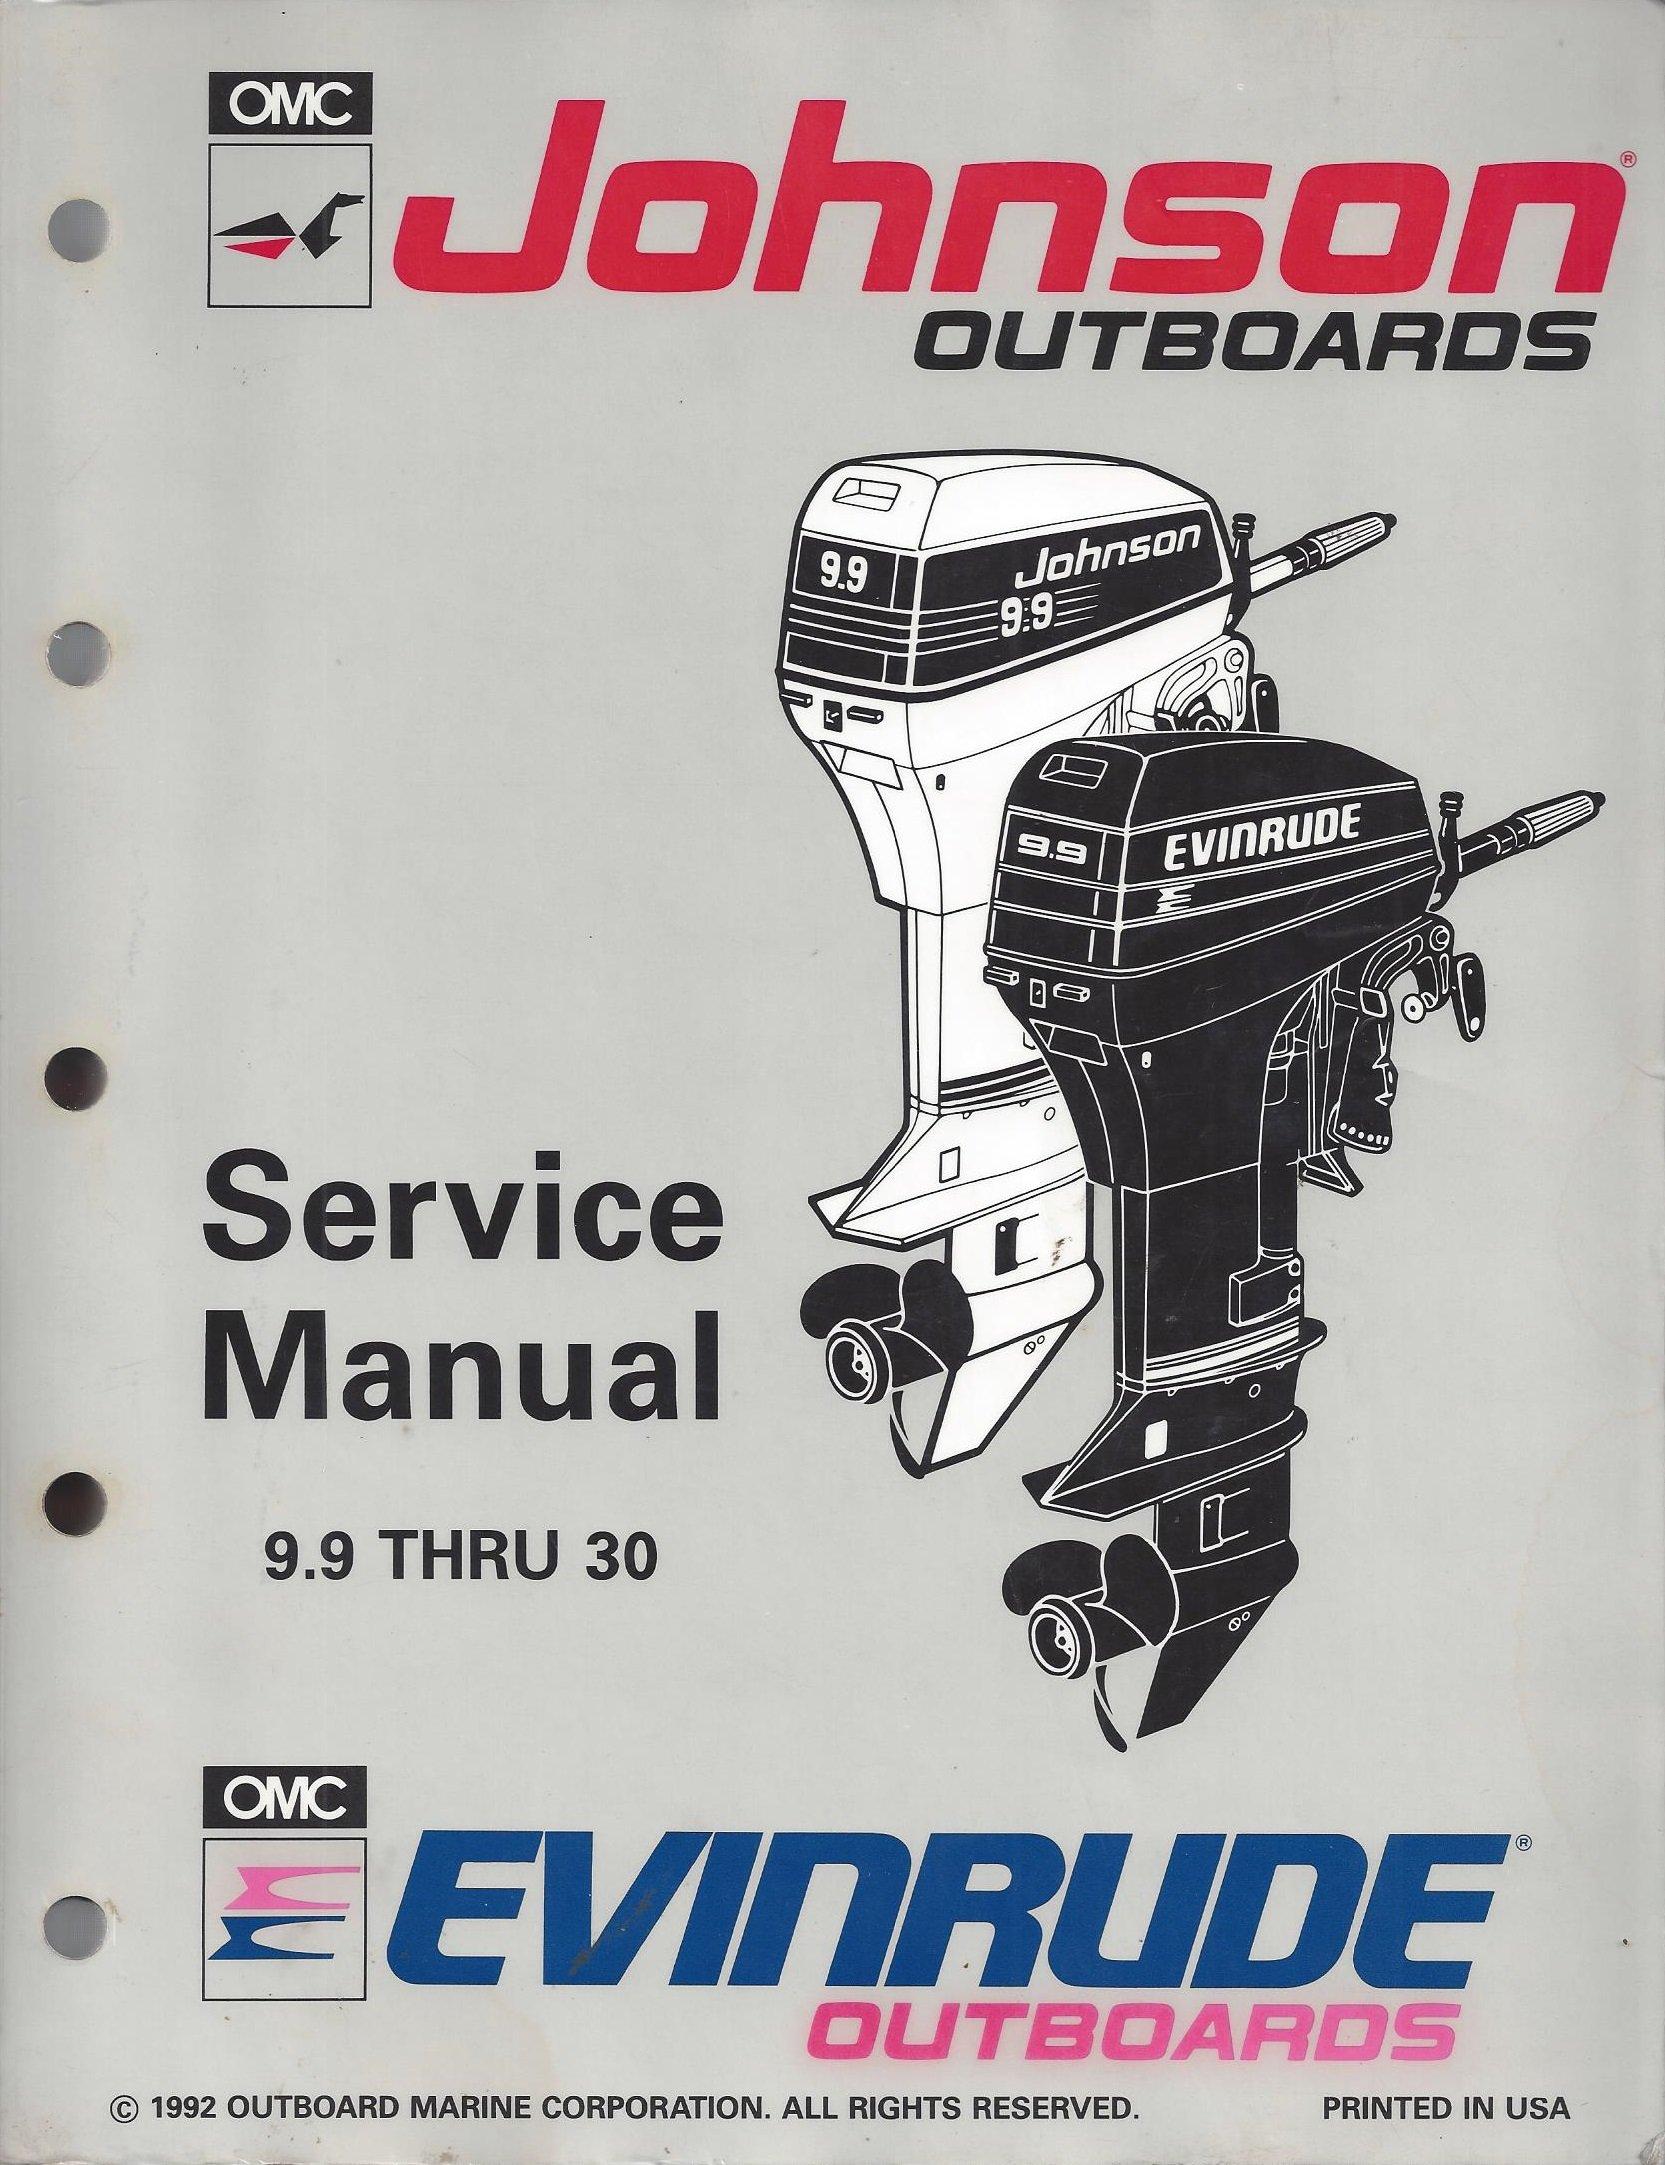 Johnson Evinrude Service Manual 9.9 thru 30 models: Outboard Marine  Corporation: Amazon.com: Books